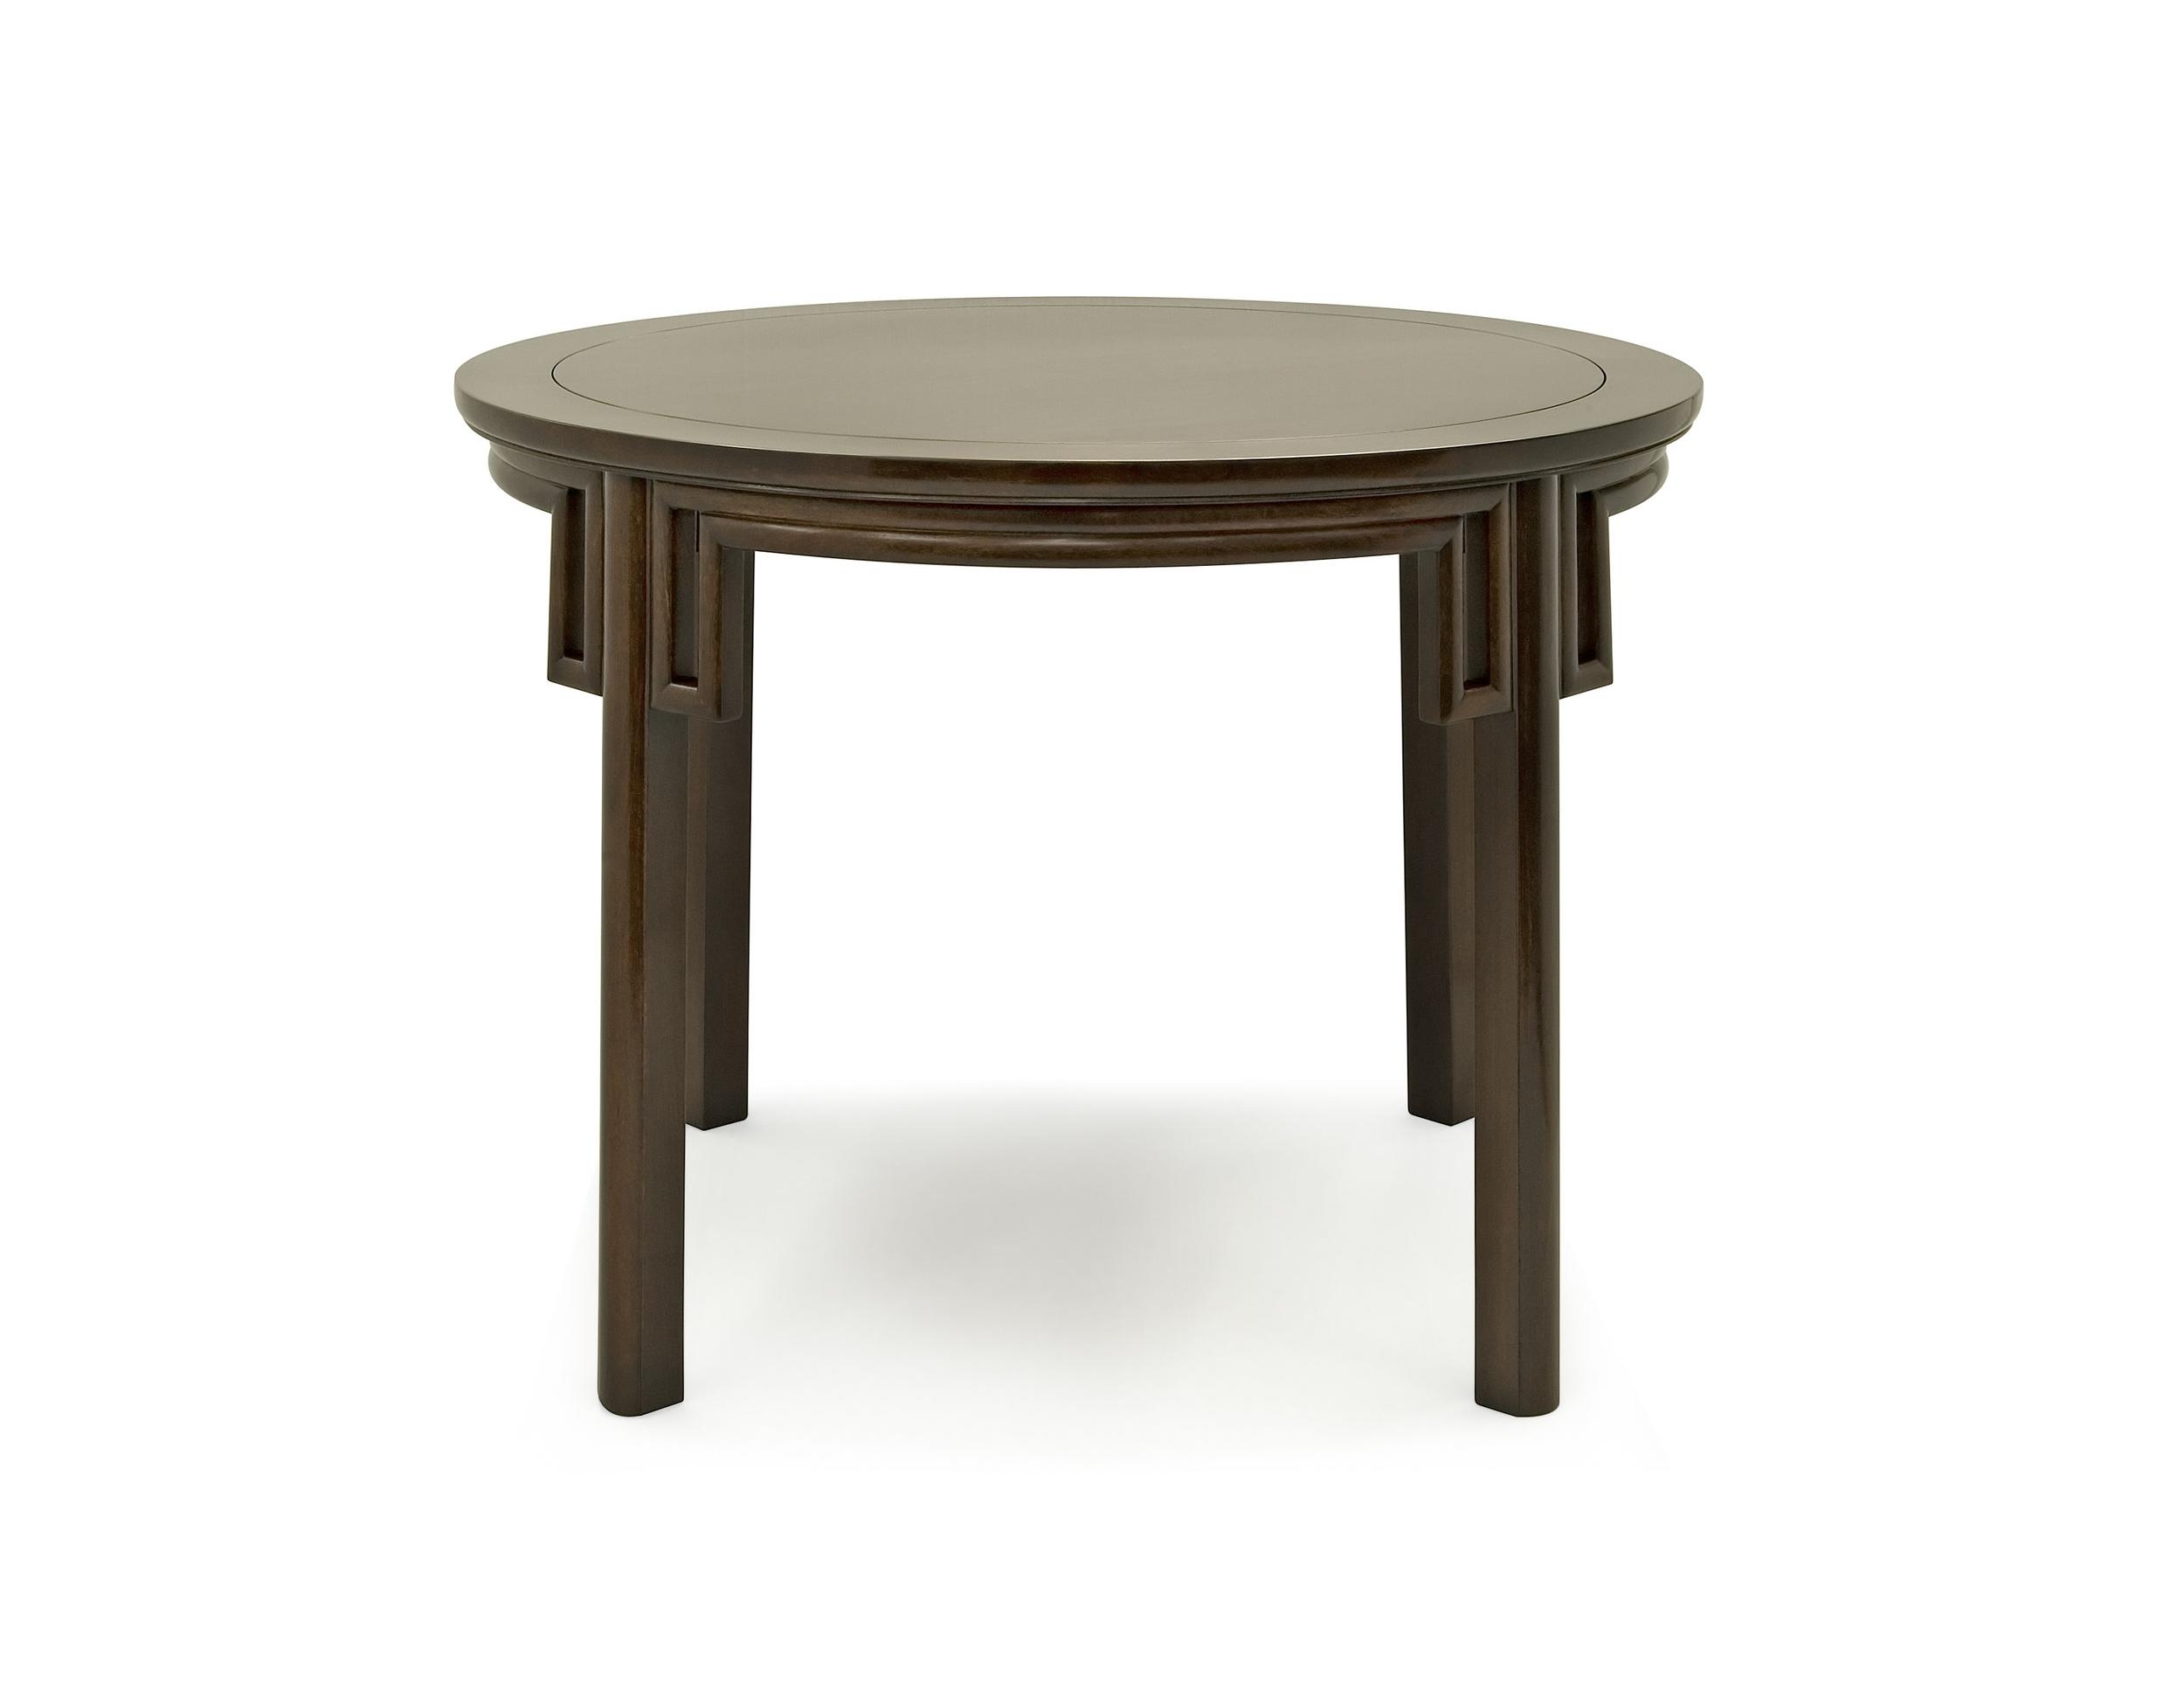 ....Bespoke Ming Style Chinese furniture : Round Table..特别定制明式中式家具: 圆台....